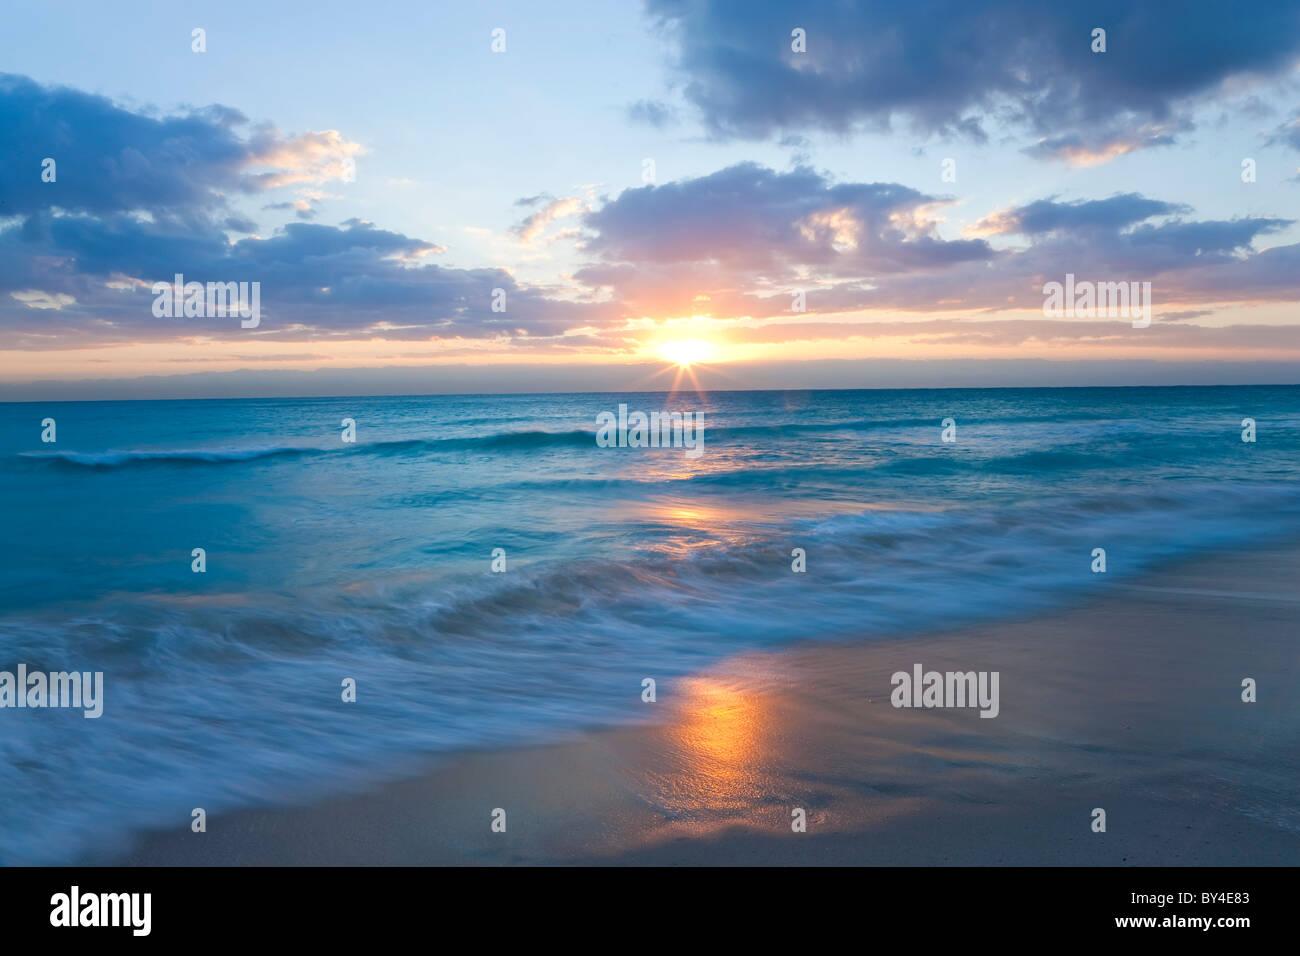 Sunrise, South Beach, Miami, Florida, USA Stockbild